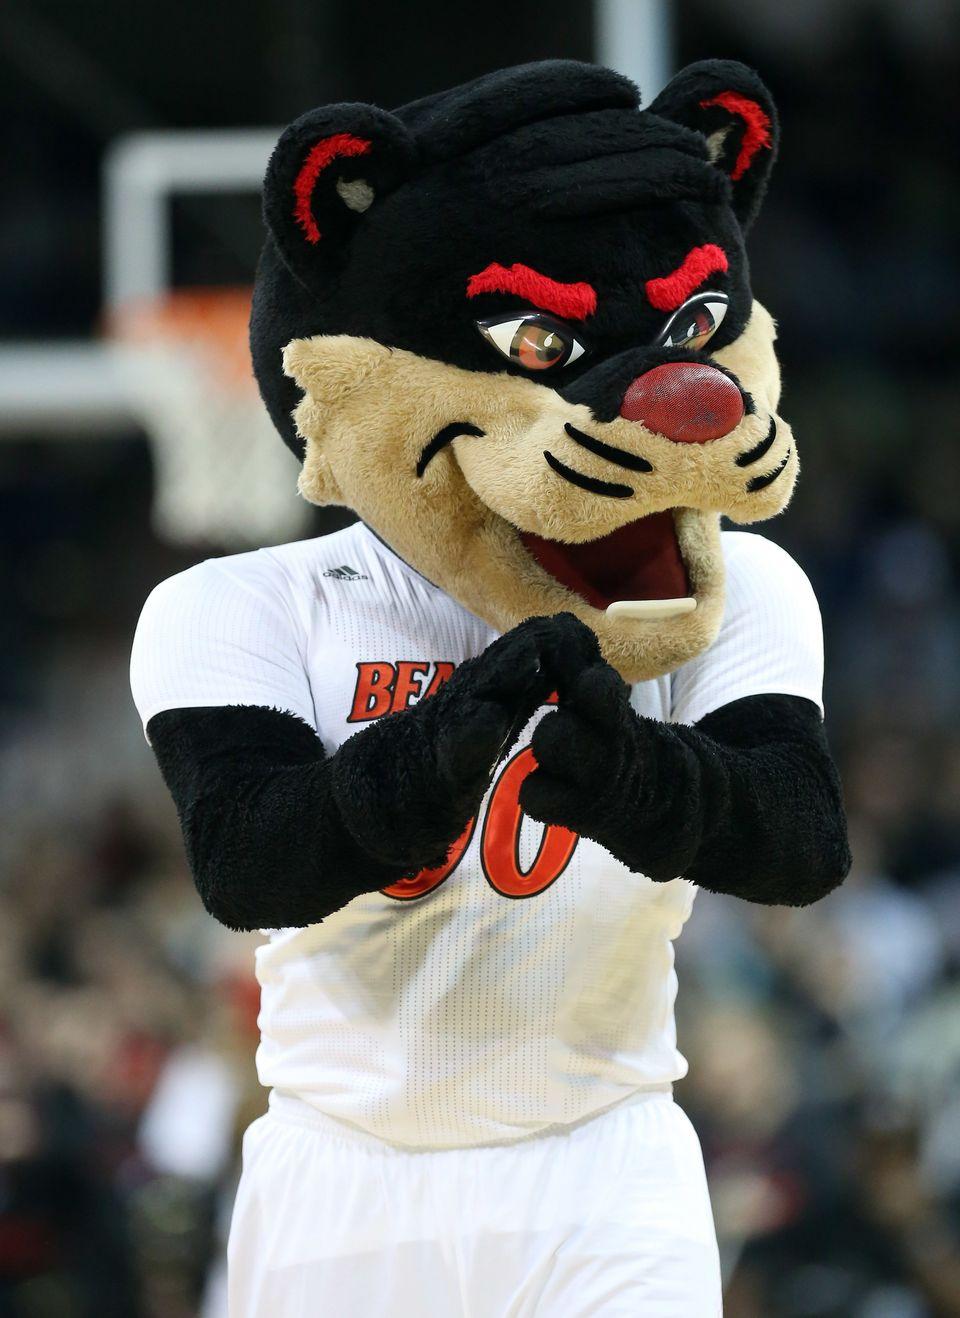 SPOKANE, WA - MARCH 20:  The Cincinnati Bearcats mascot cheers on his team during their game against the Harvard Crimson in t